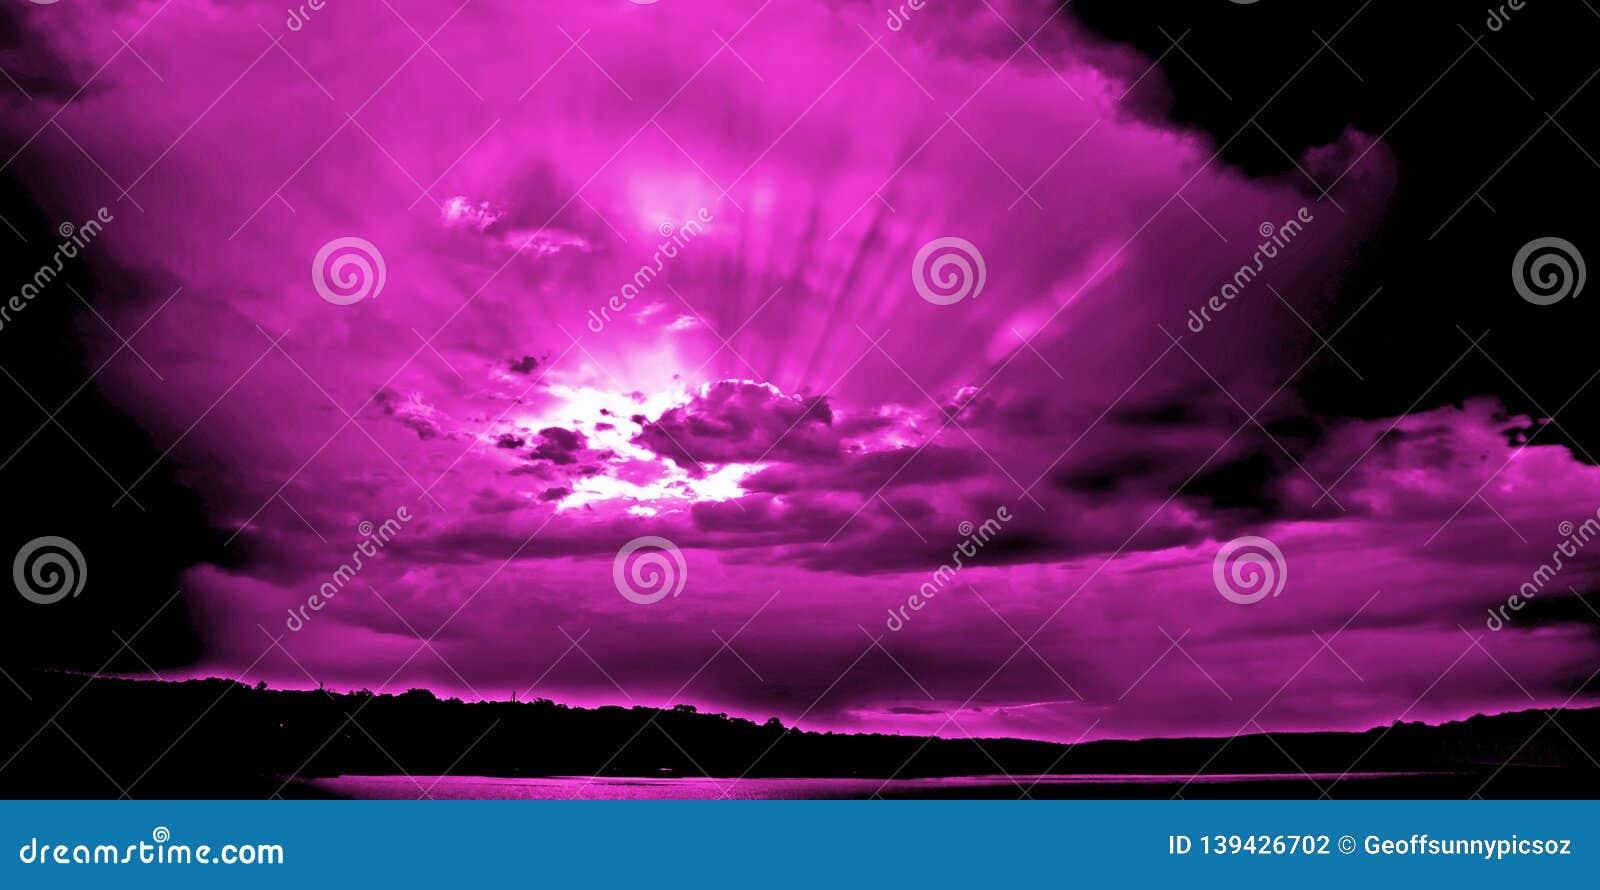 Magenta Sunset with Suns Rays